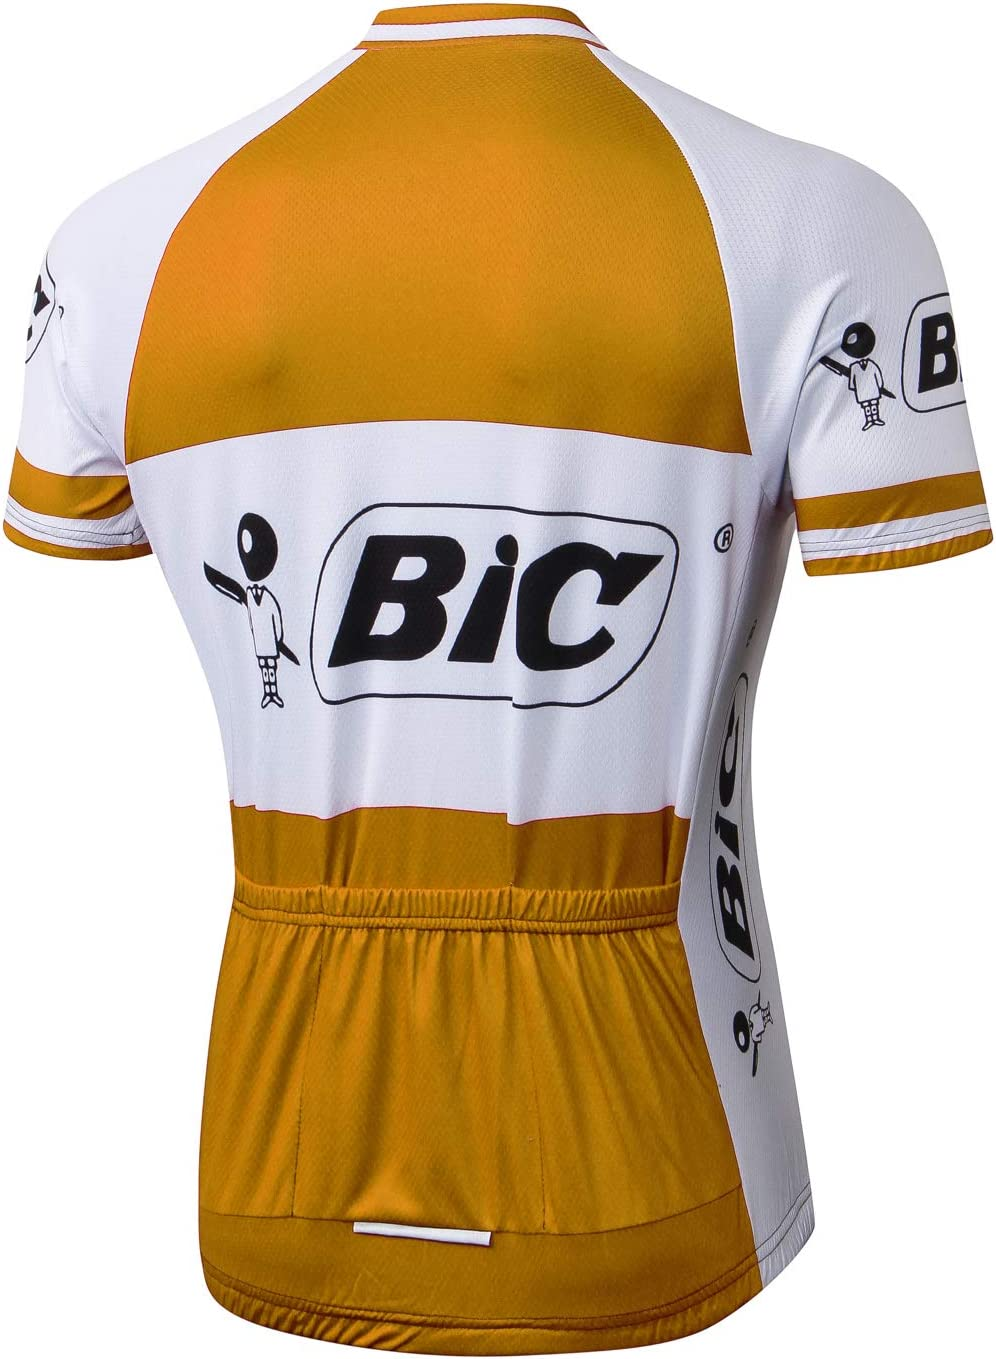 Alpediaa Maillot Ciclismo Hombrs,BIC Naranja Maillots de Bicicleta ...